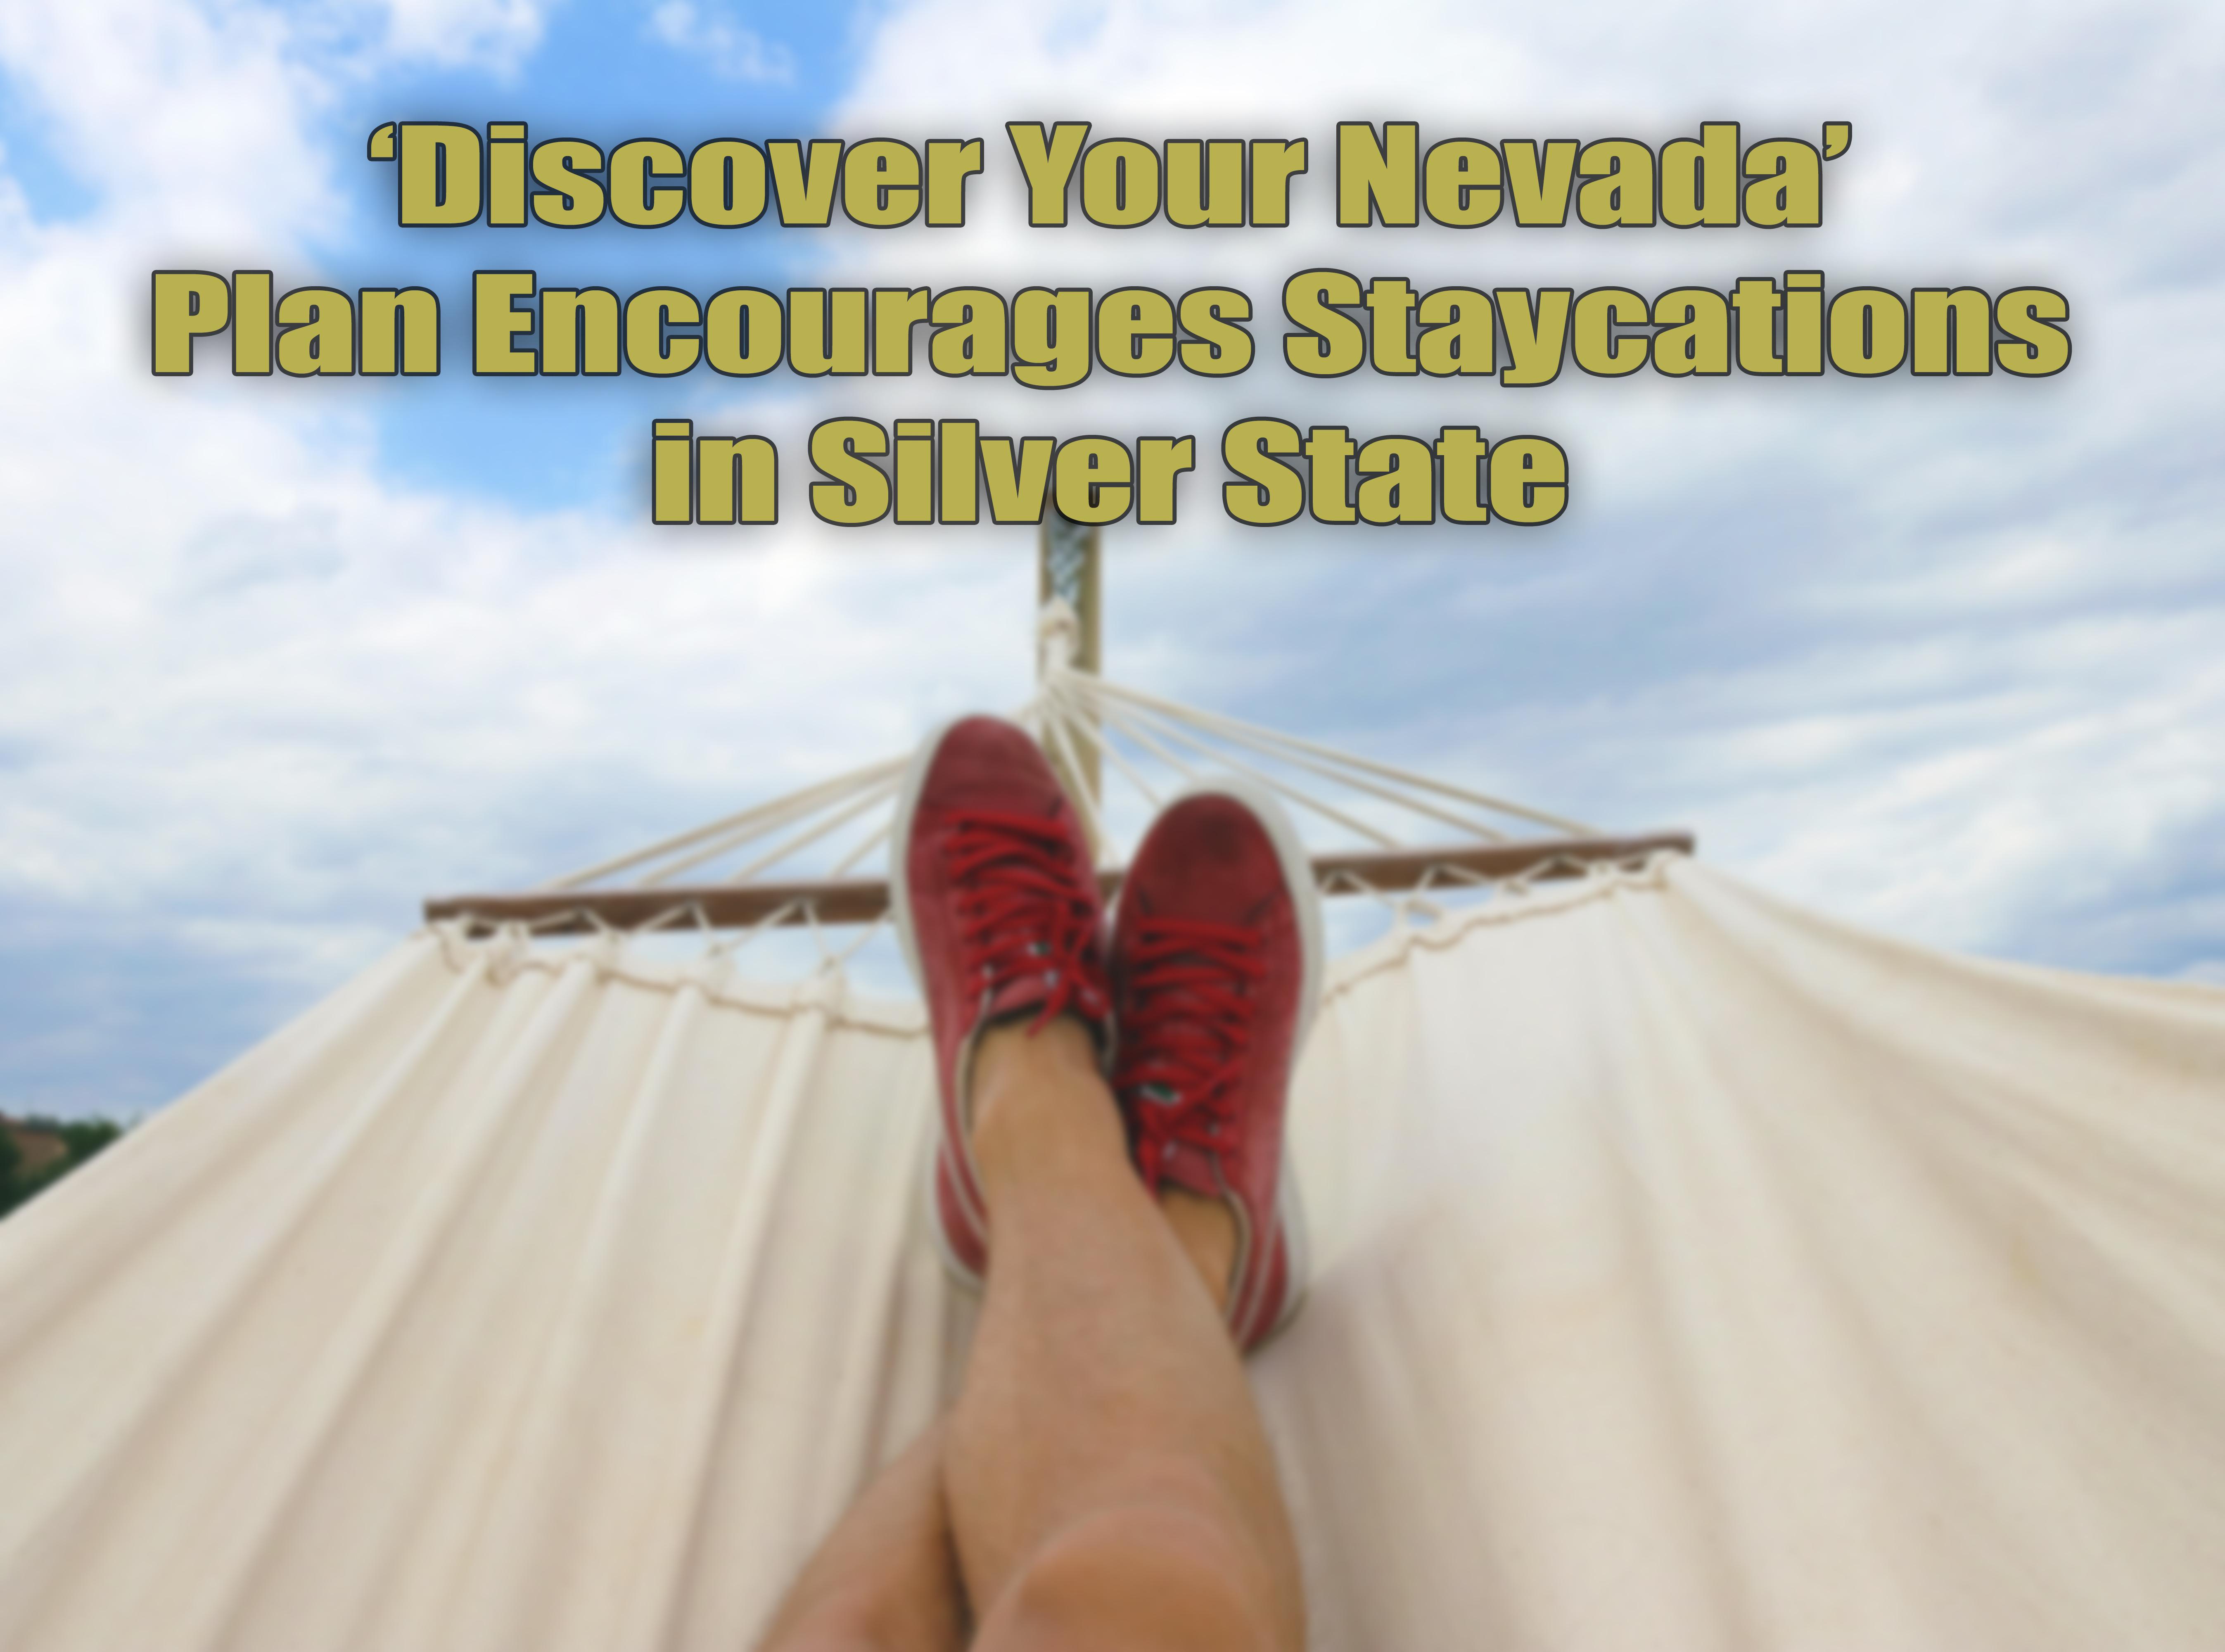 Silver State Las Vegas.jpg